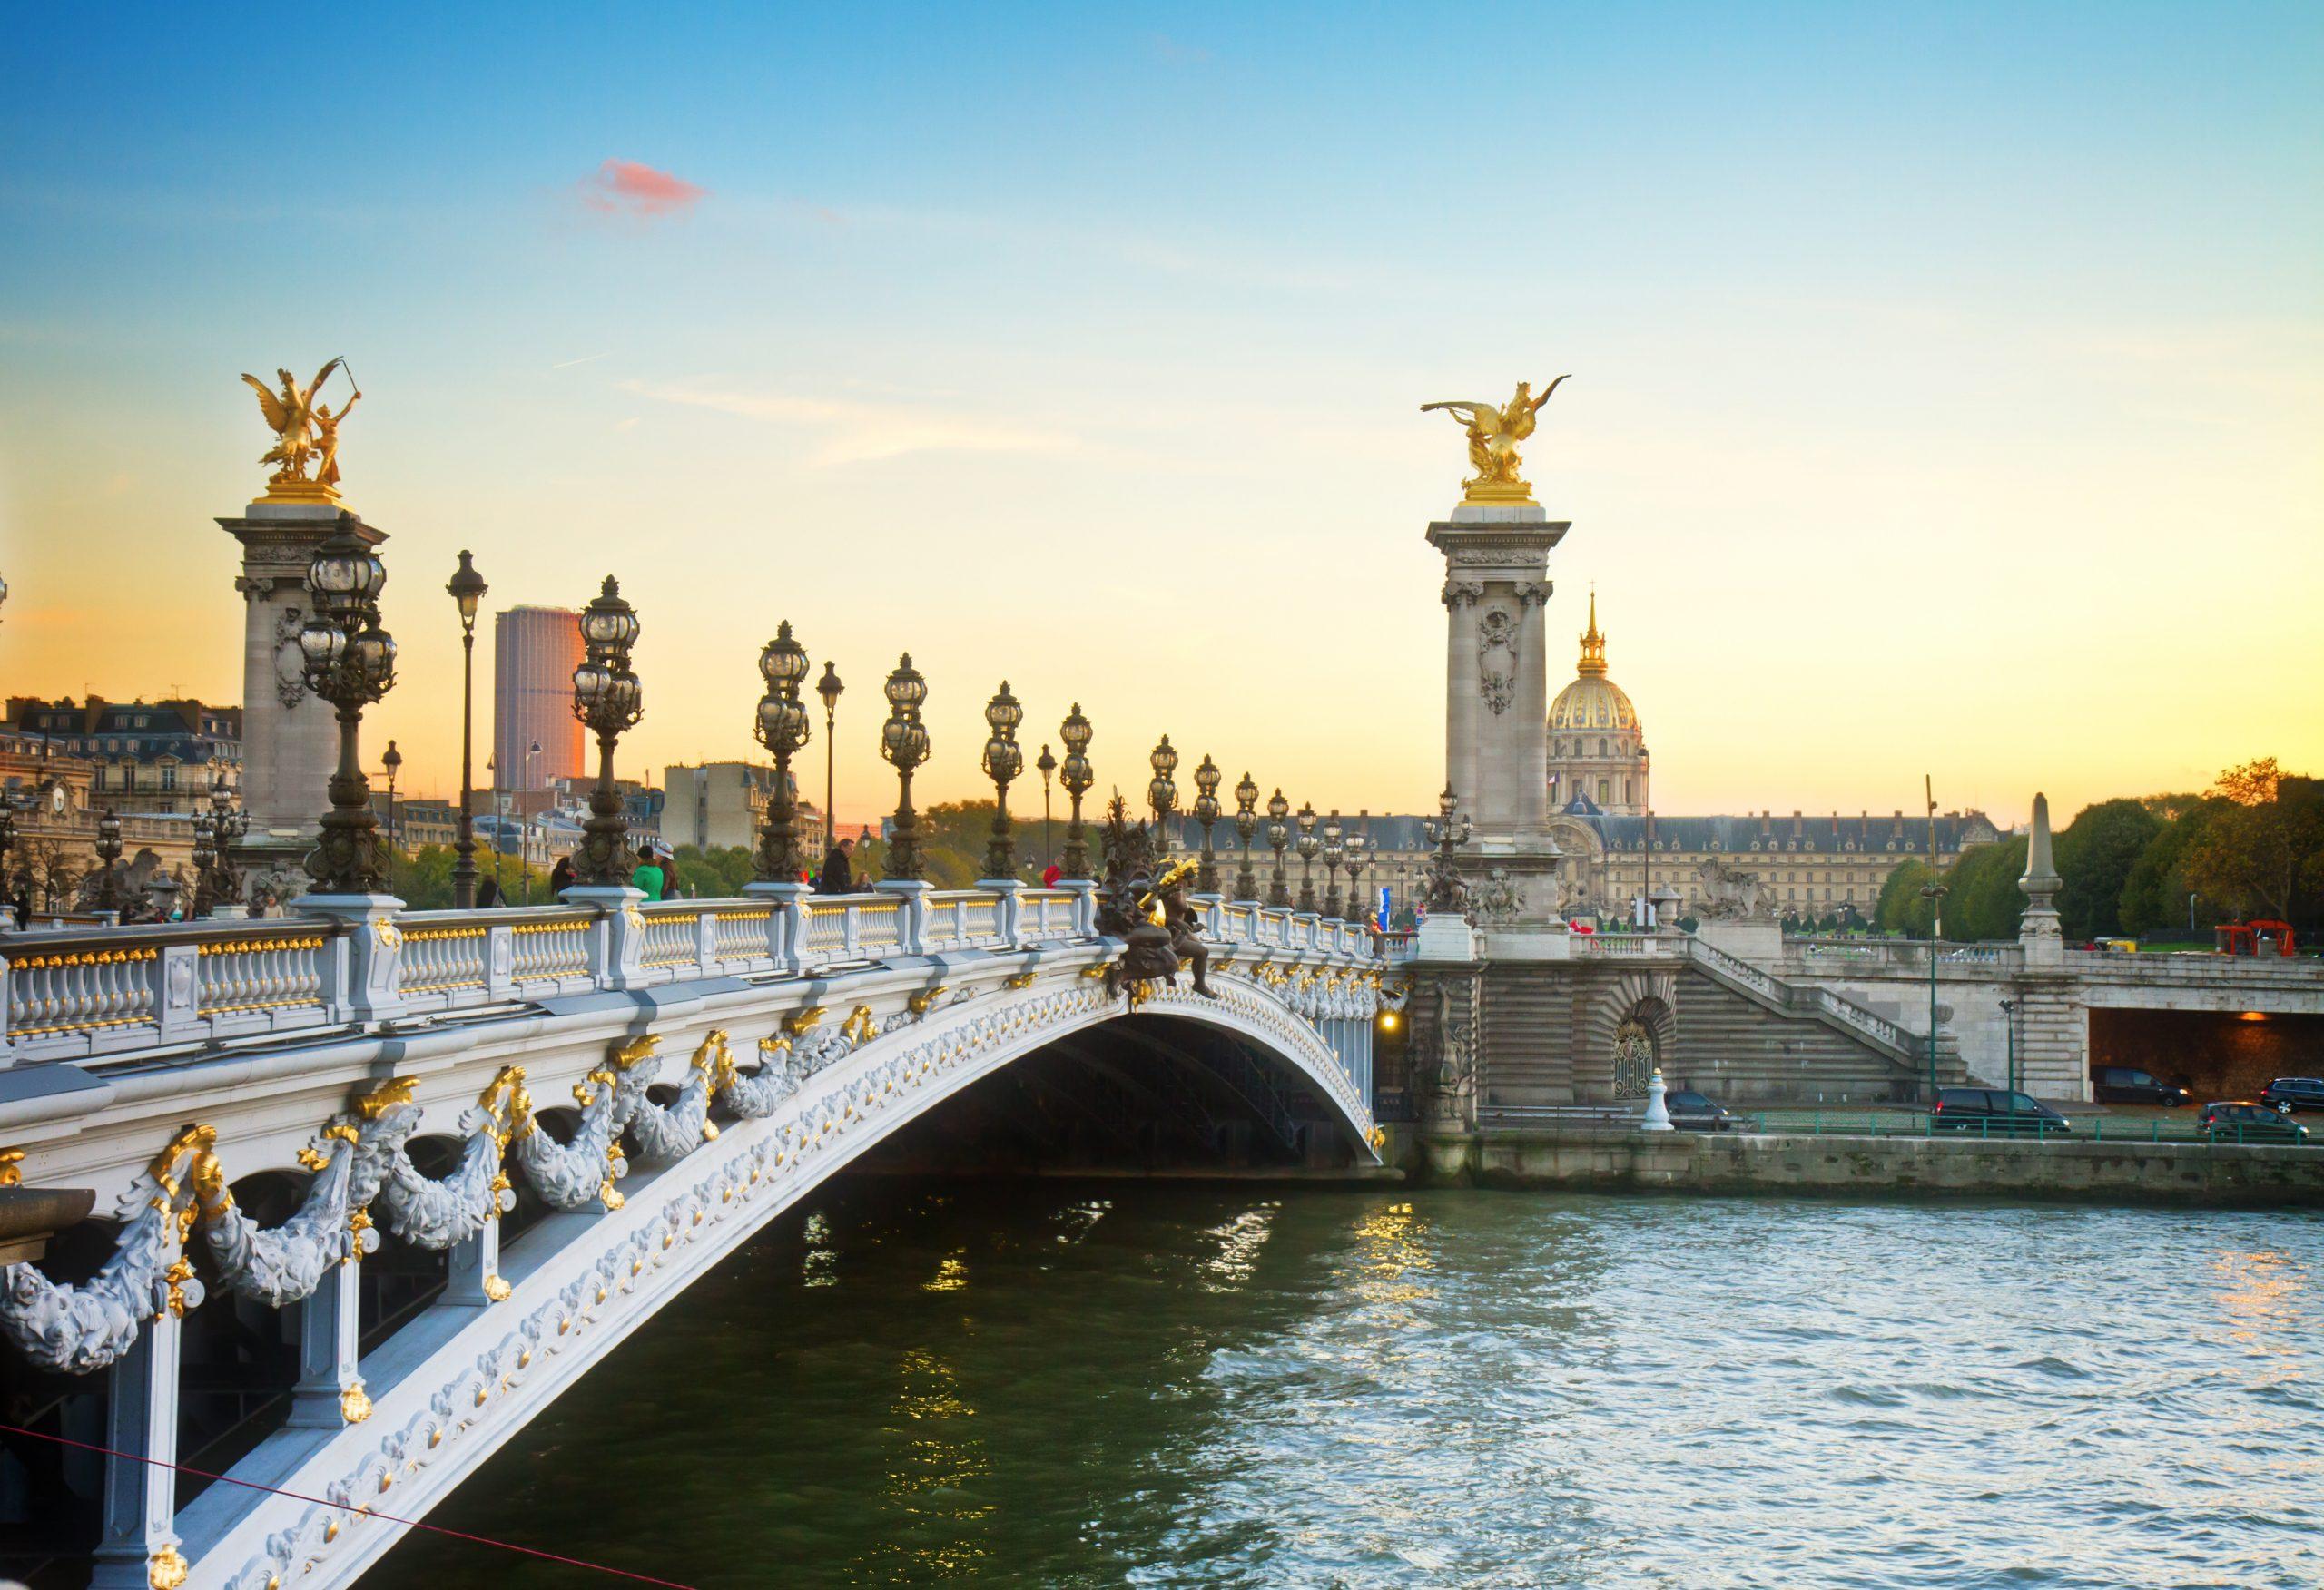 the best views in Paris can be found at Ponte Alexander bridge